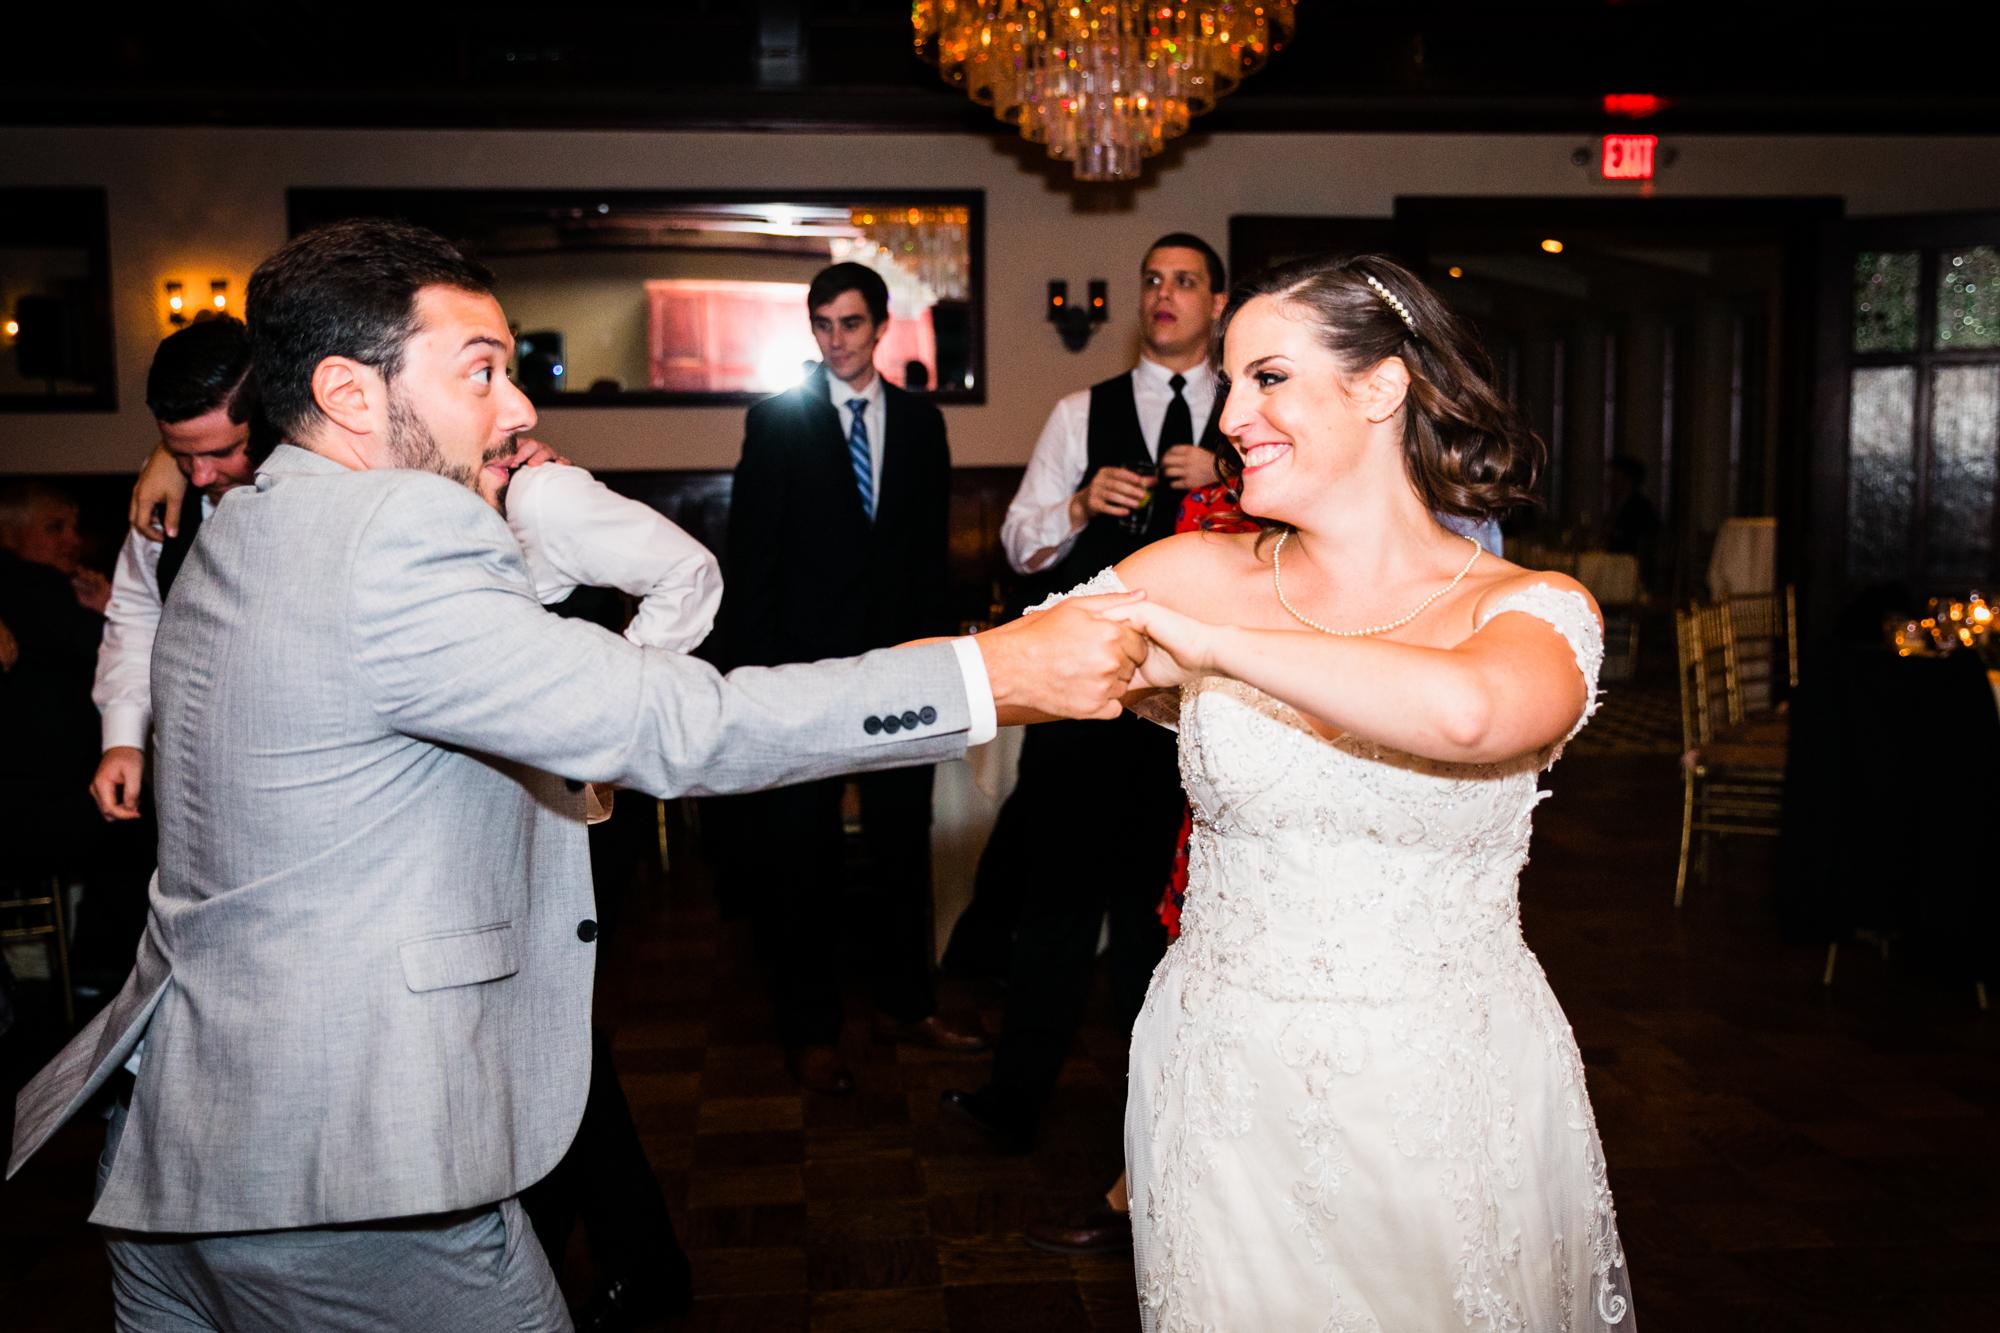 Hotel Du Village - LoveStruck Pictures - Wedding Photography-105.jpg